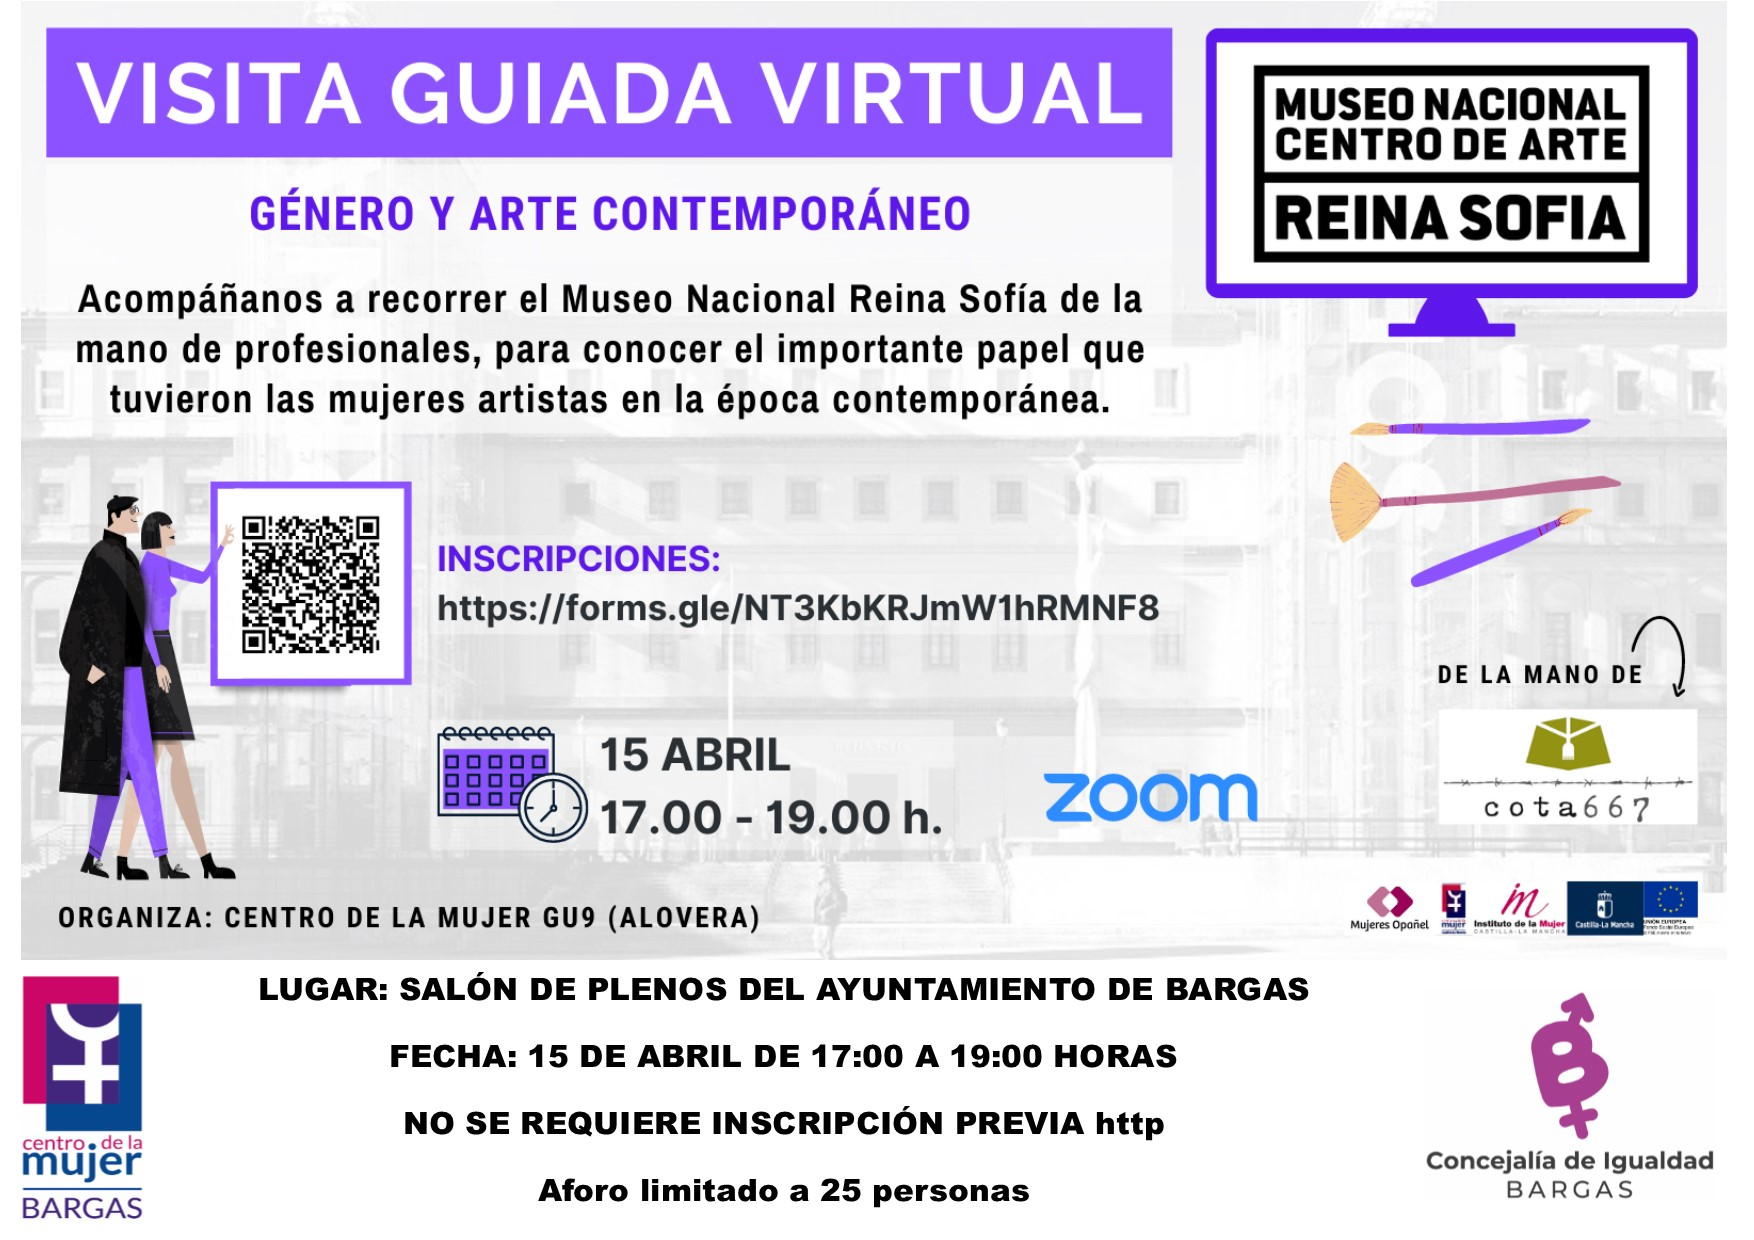 Visita guiada virtual: Museo Nacional «Reina Sofía»